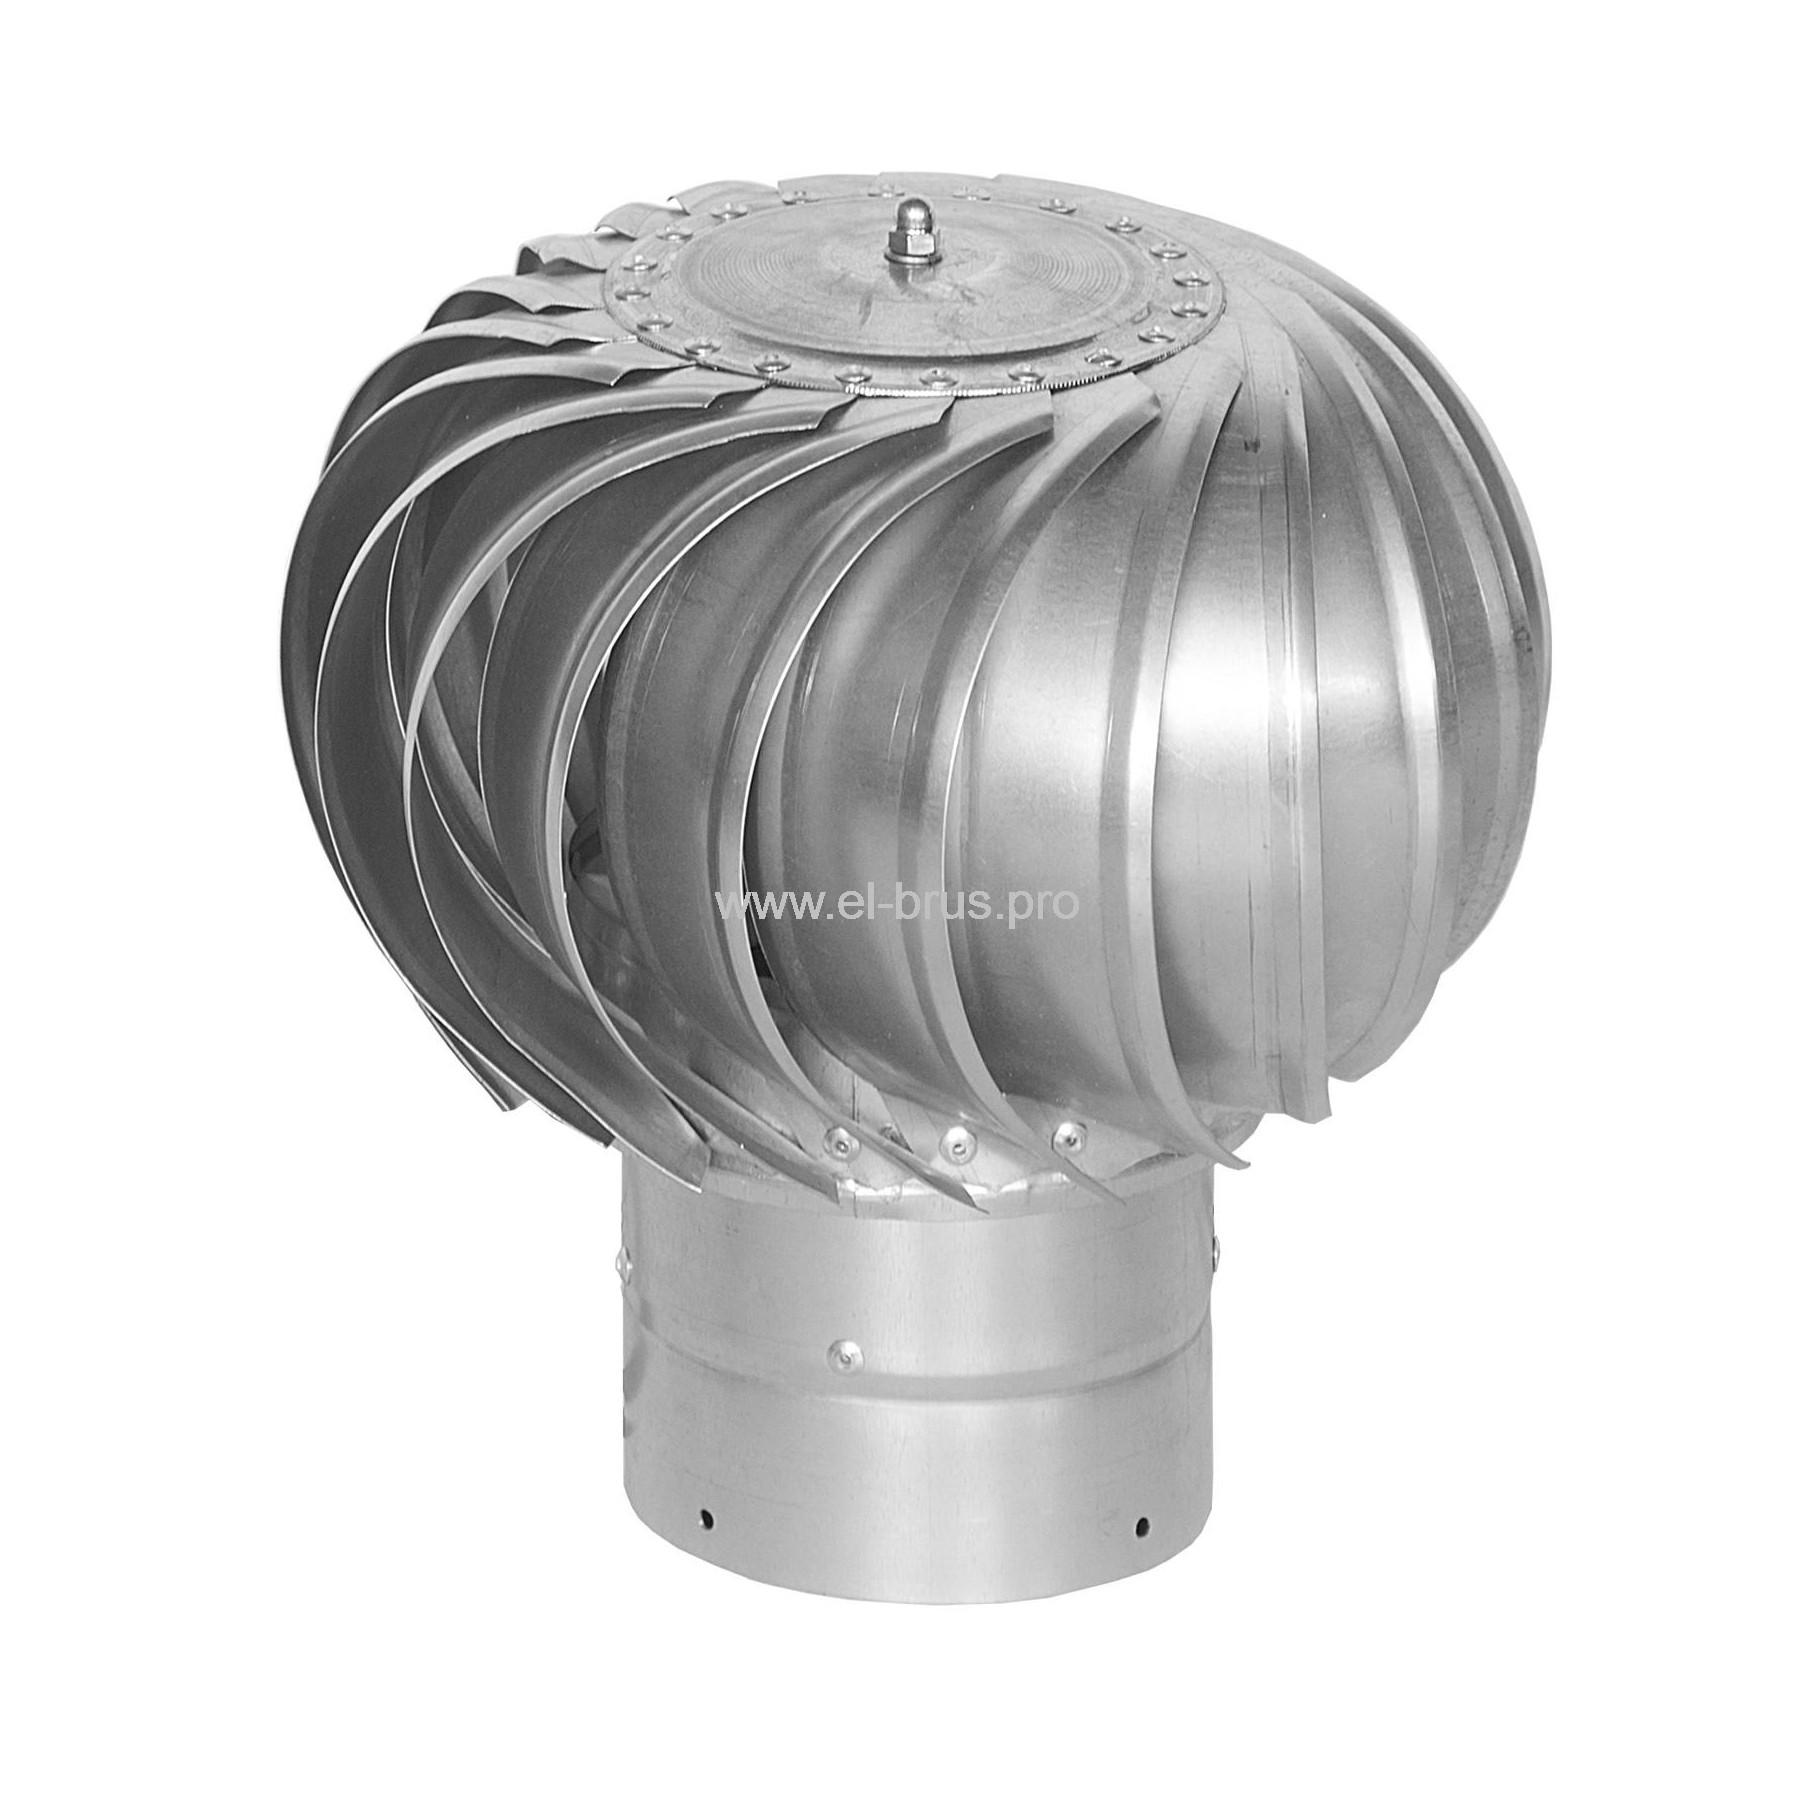 Турбодефлектор оцинк. металл Ø100мм